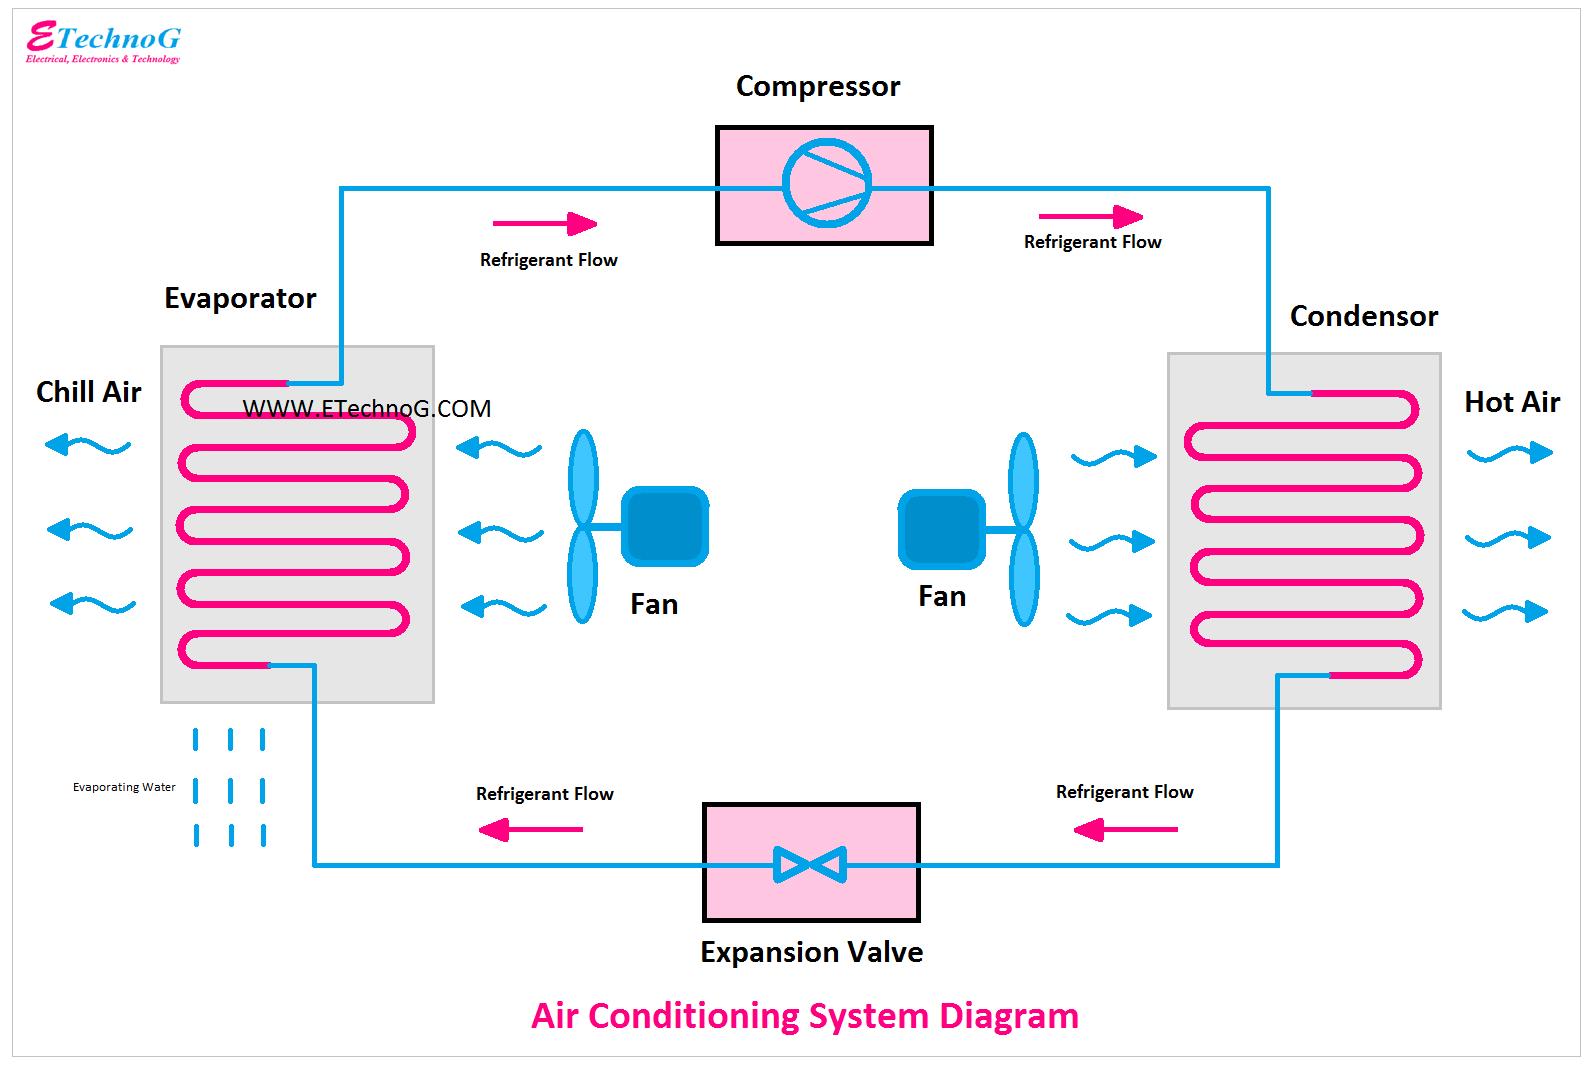 Air Conditioning System Diagram, Diagram of Air Conditioning System